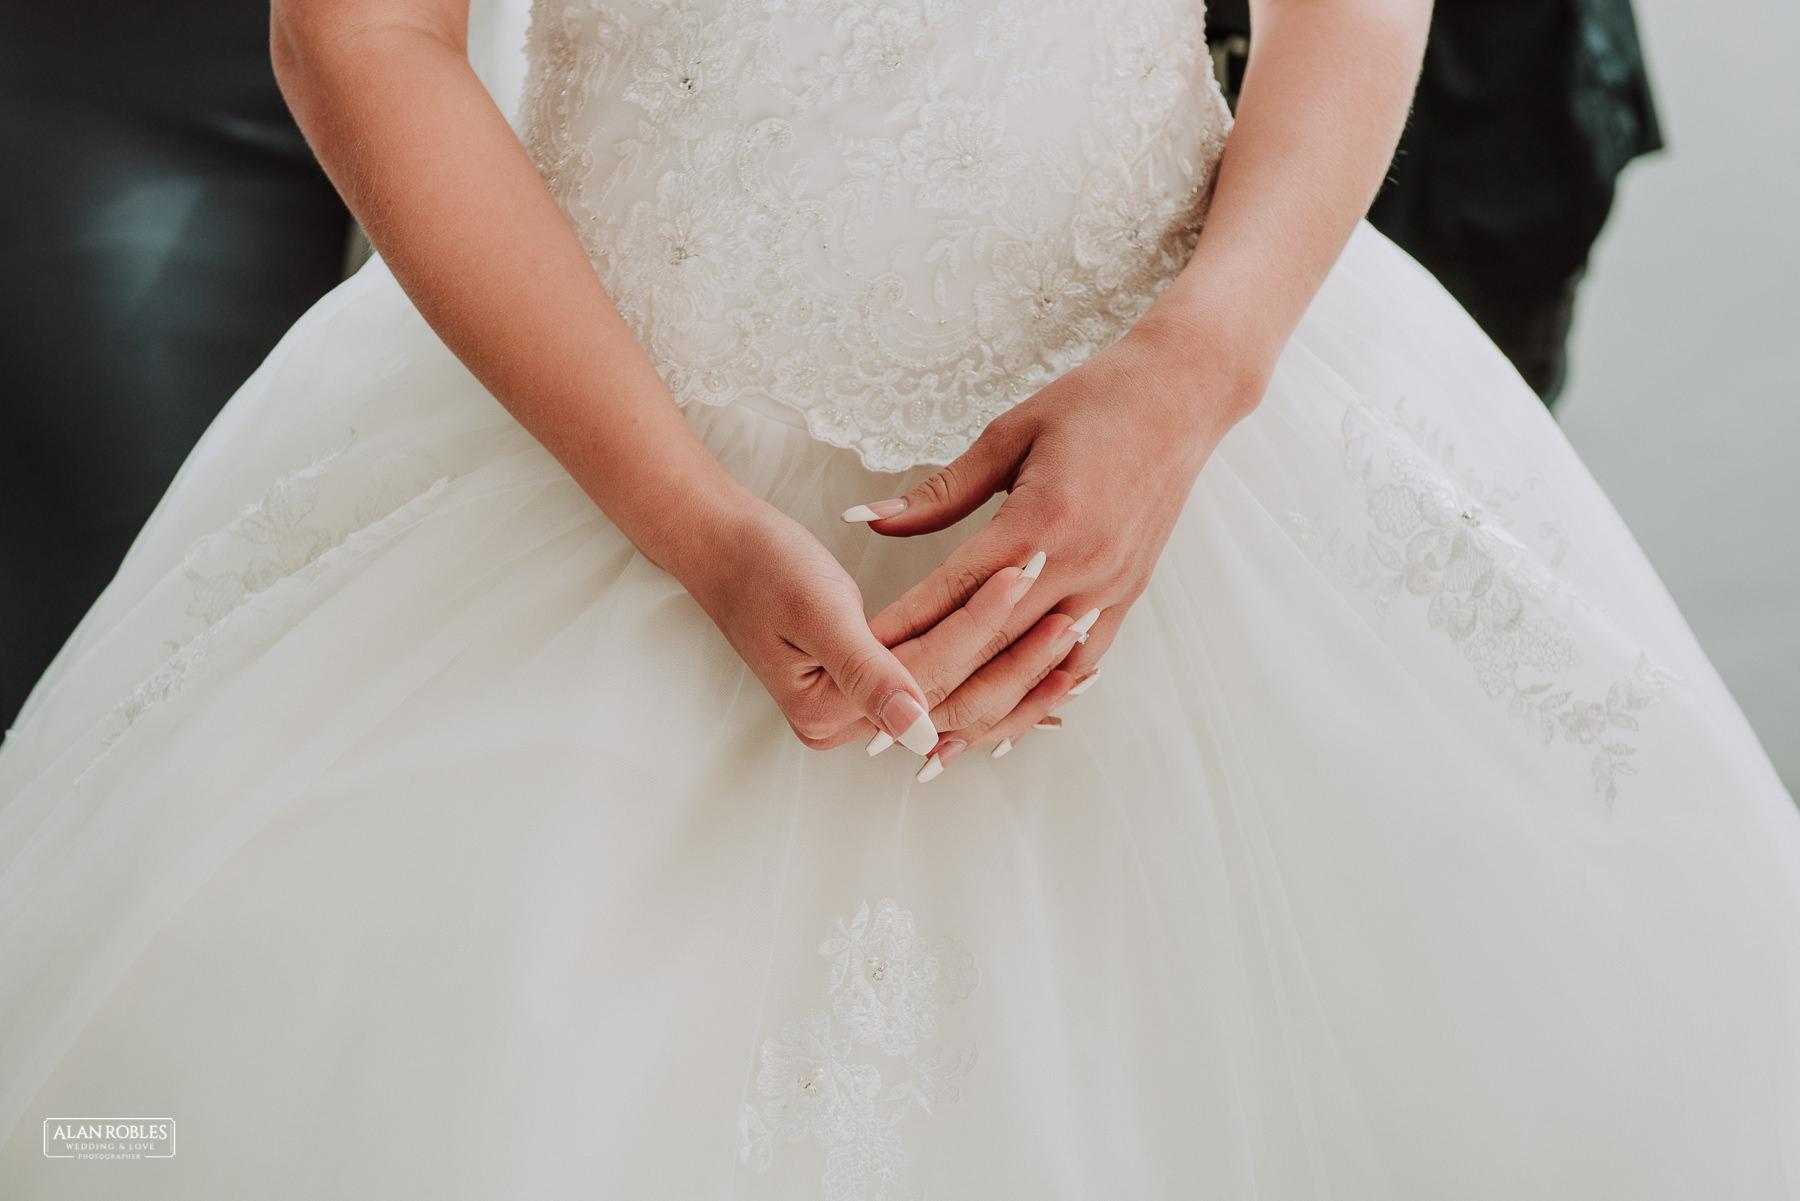 Alan Robles fotografo de bodas guadalajara - LyP Hotel Demetria-19